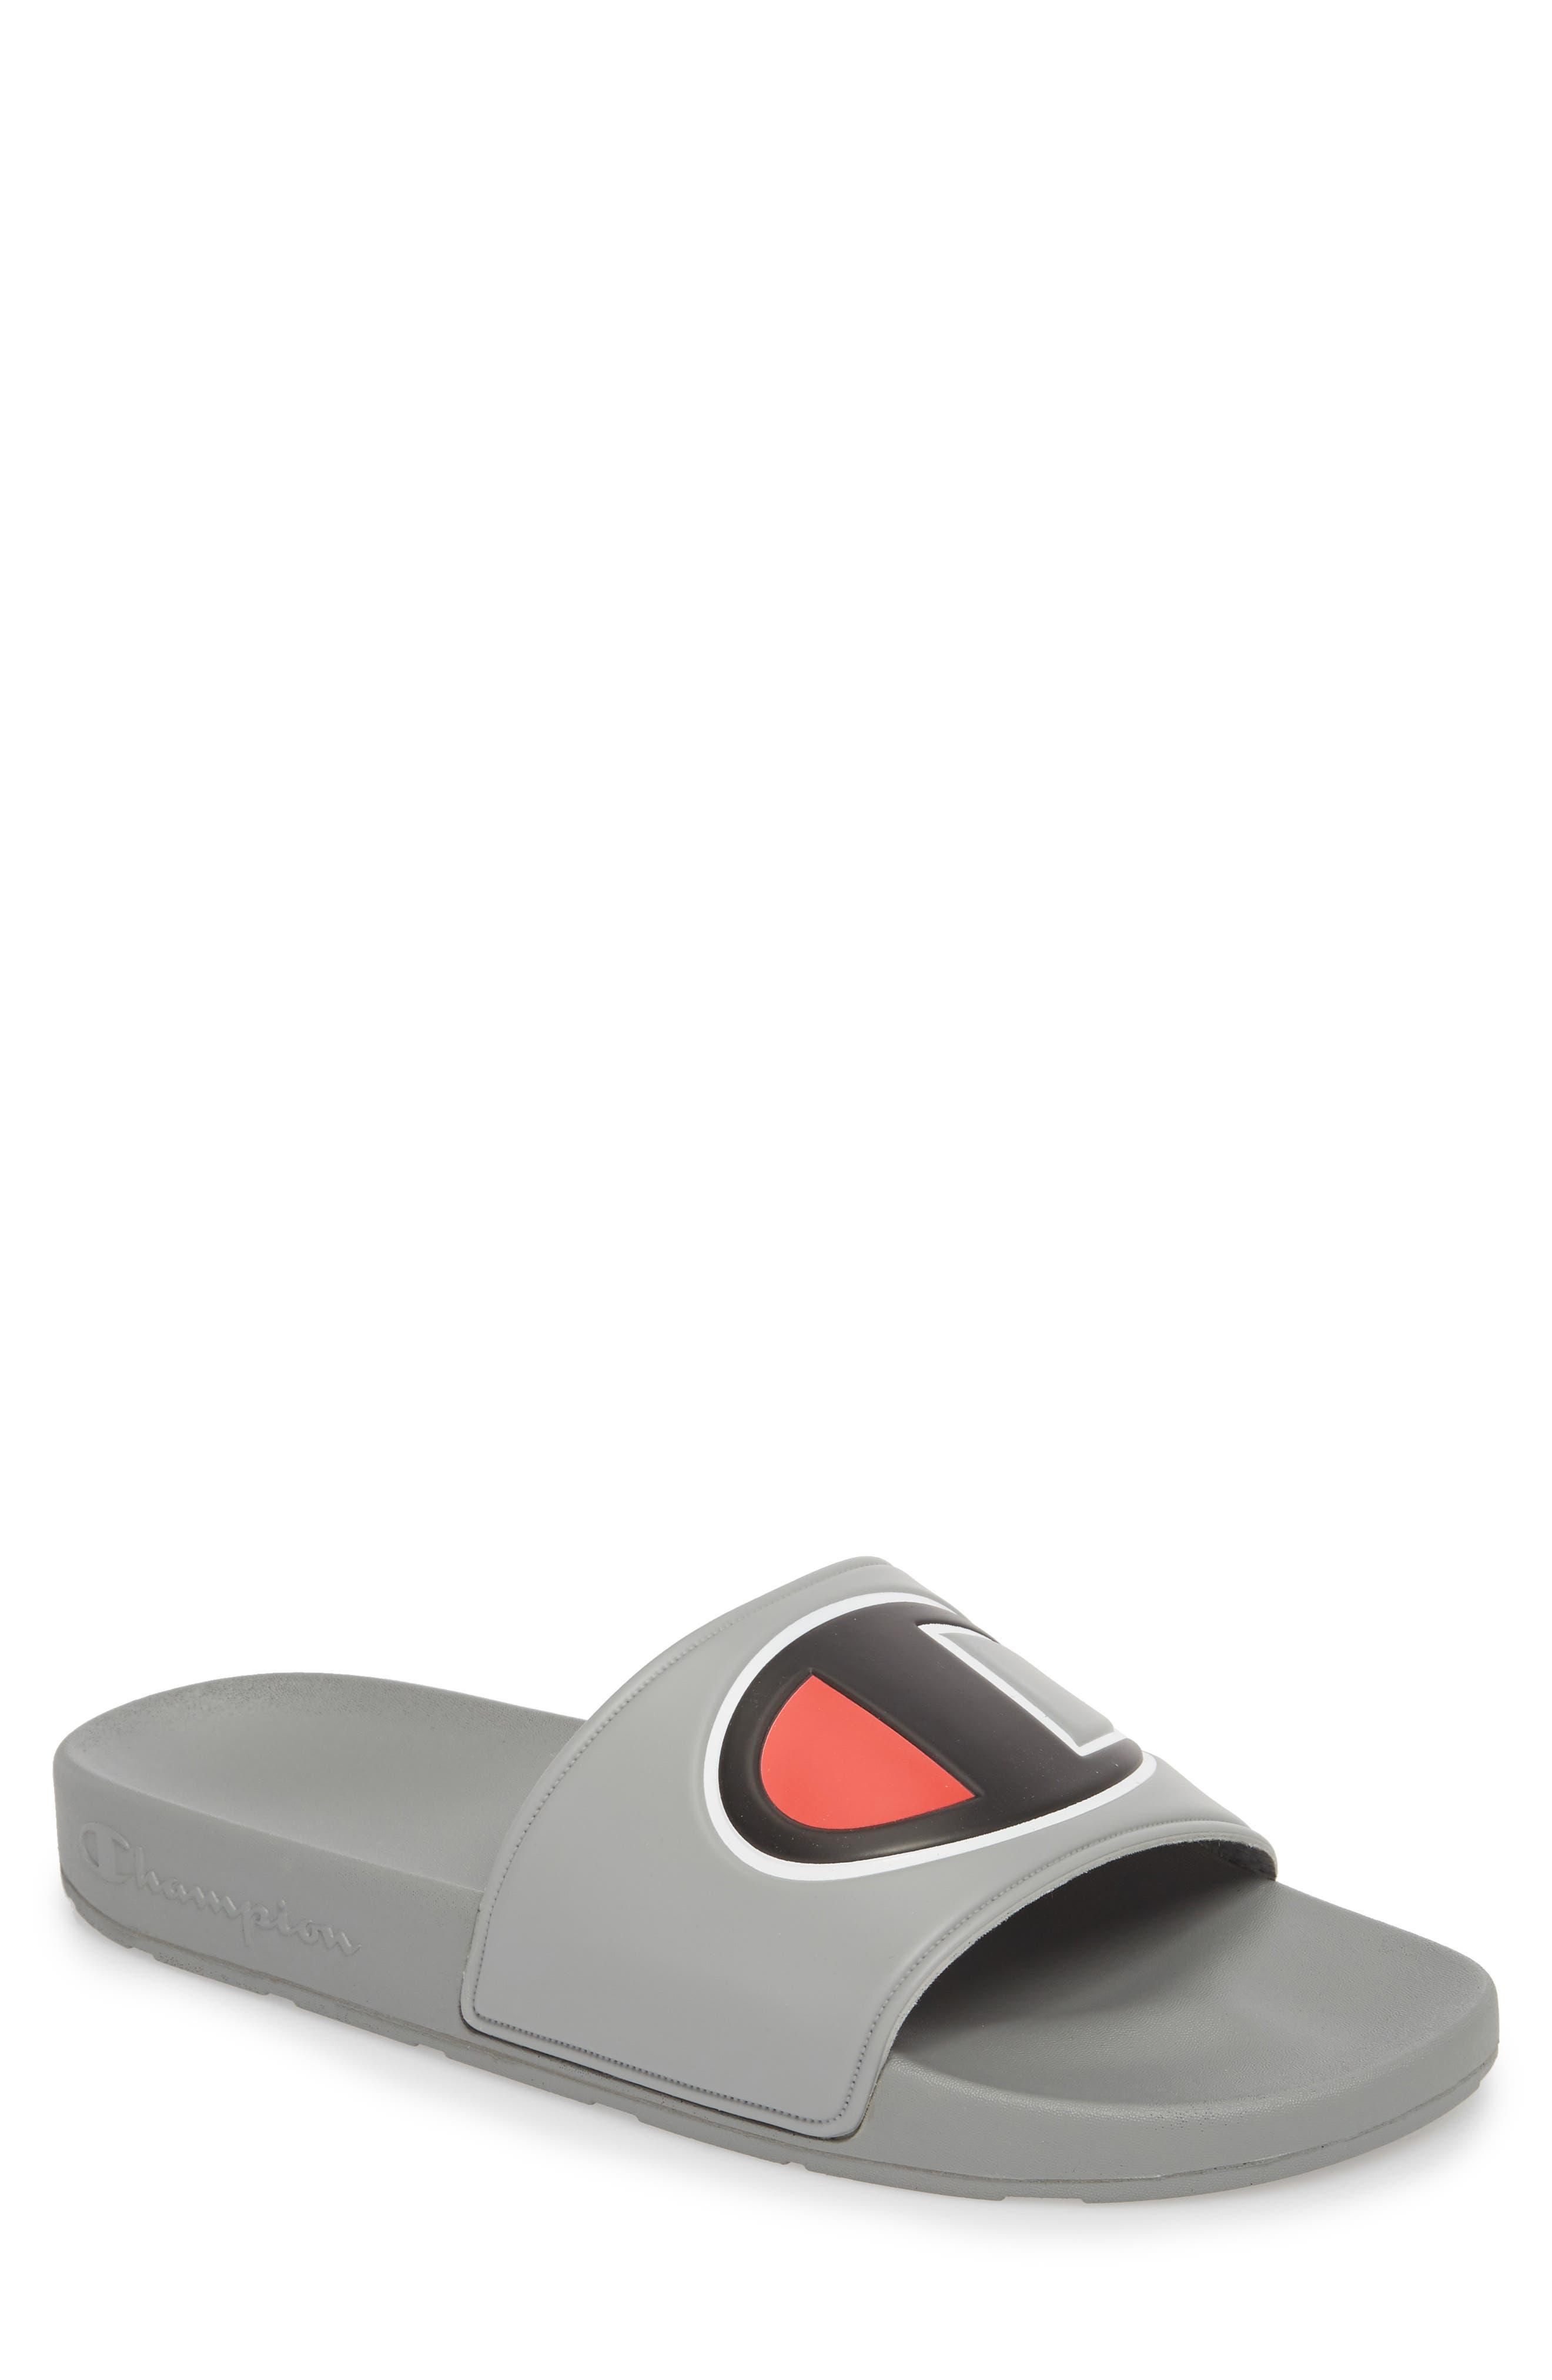 IPO Sports Slide Sandal,                         Main,                         color, GREY